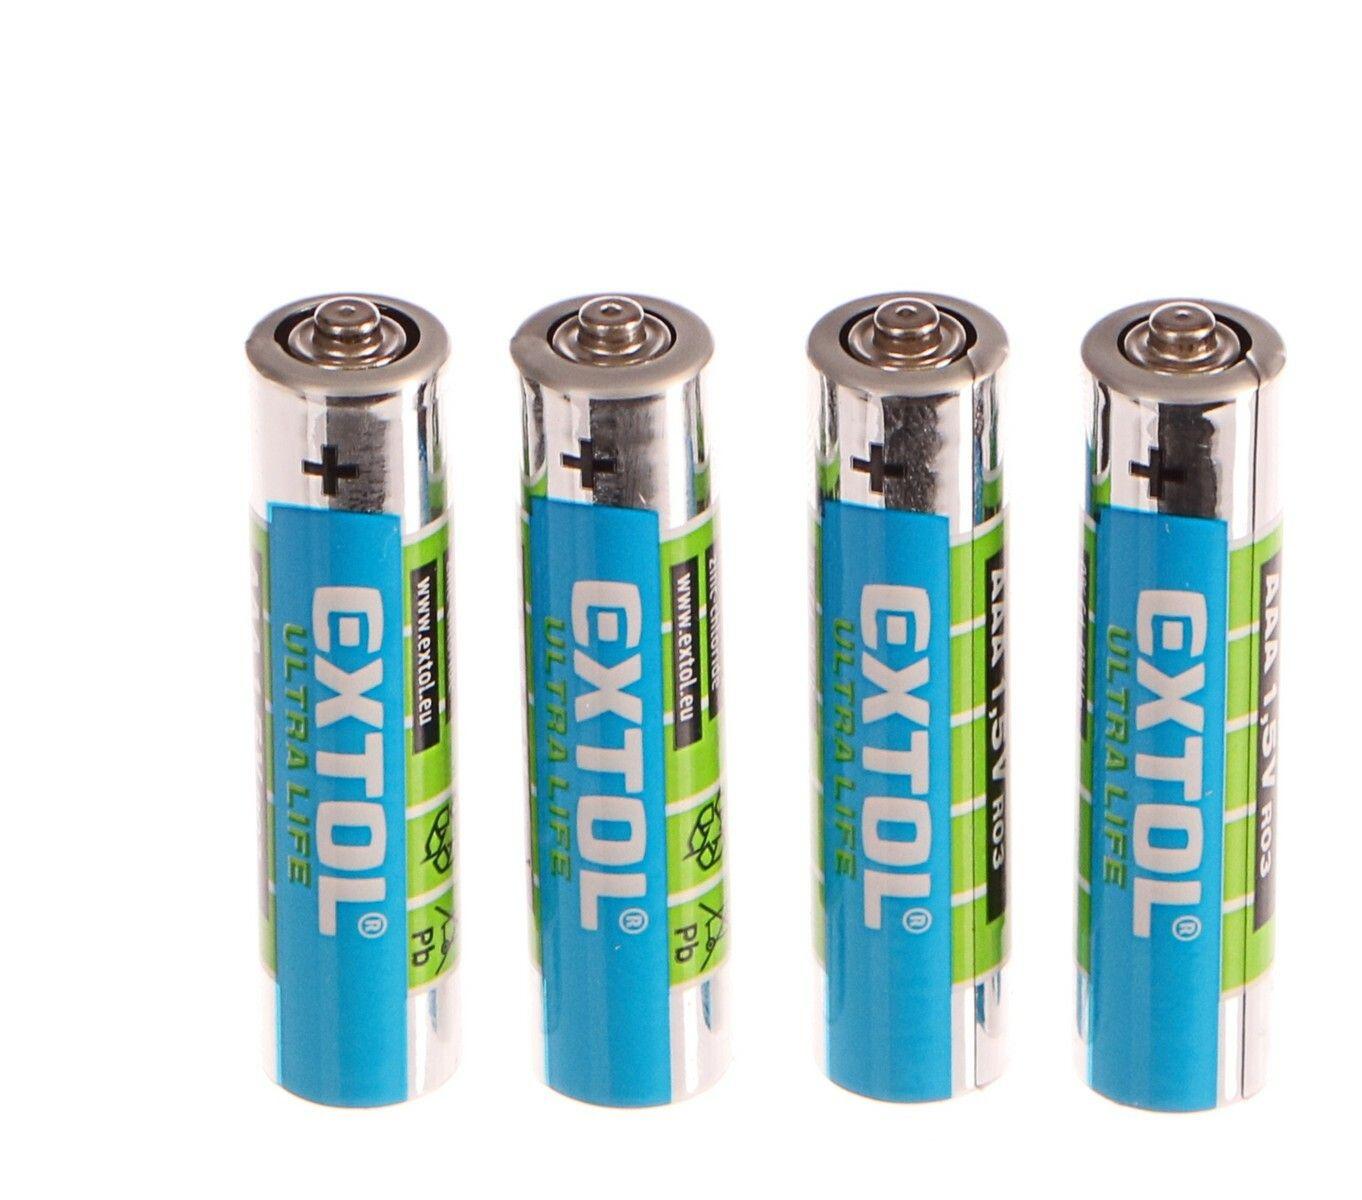 Baterie zink-chloridové, 4ks, 1,5V AAA (LR03) EXTOL-LIGHT